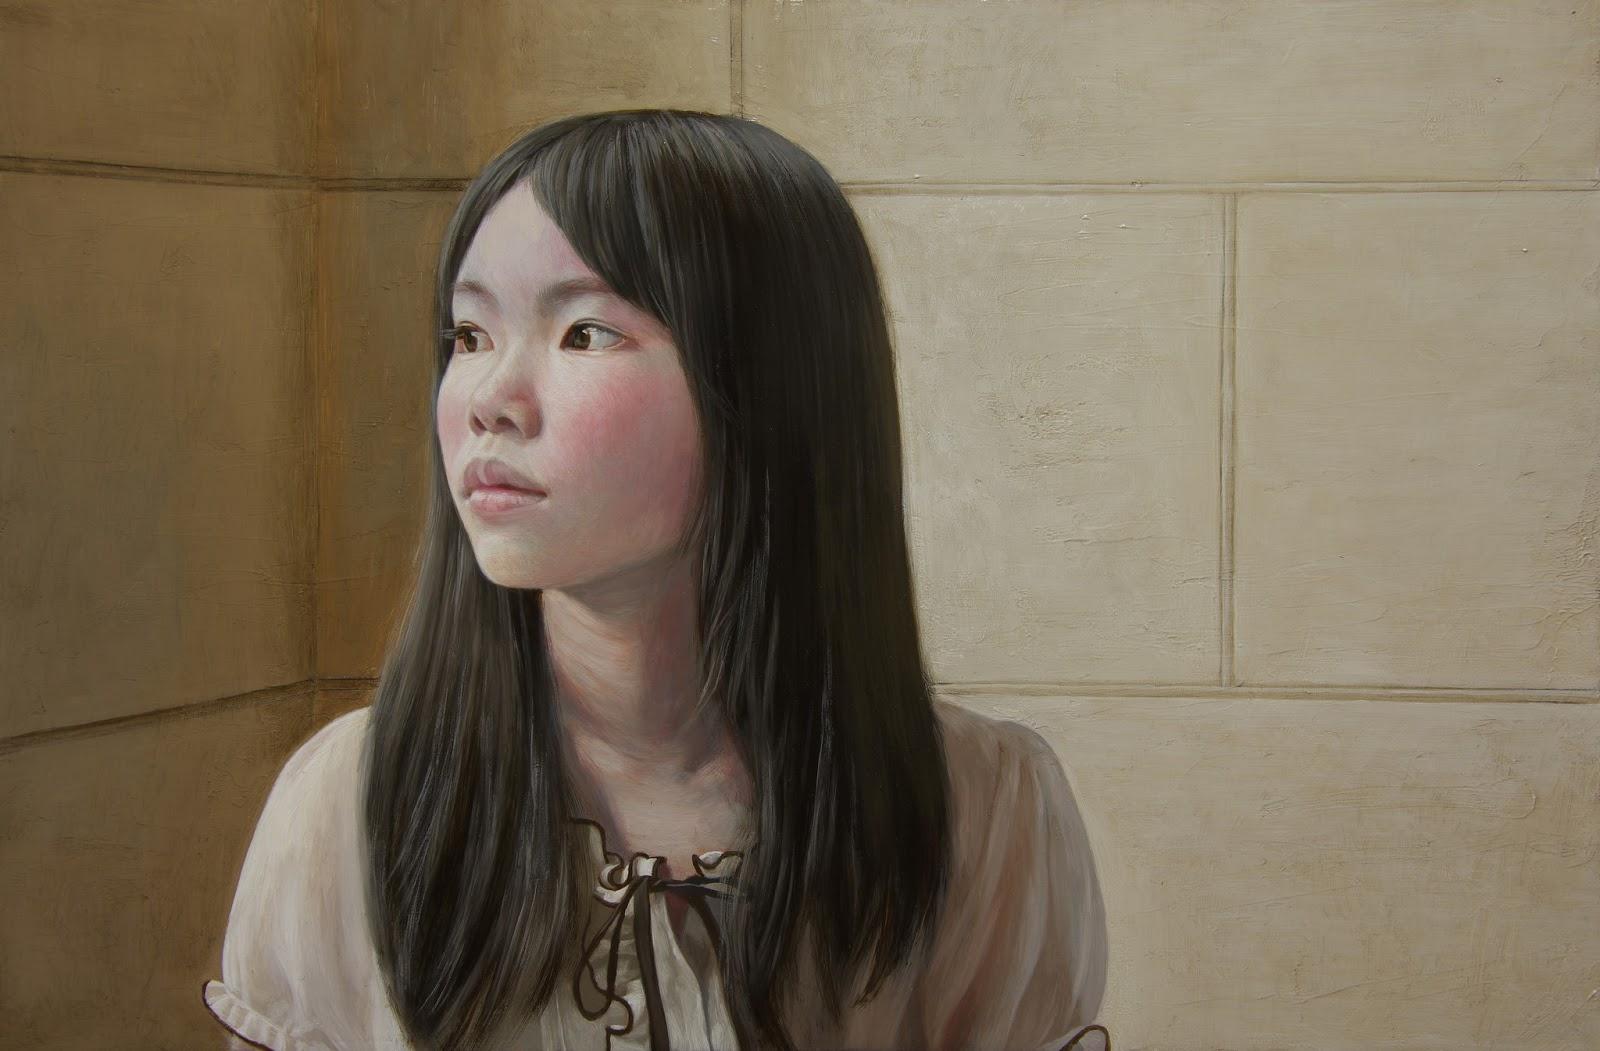 Oil Paintings By 茶谷雄司 (Yuji Chaya)